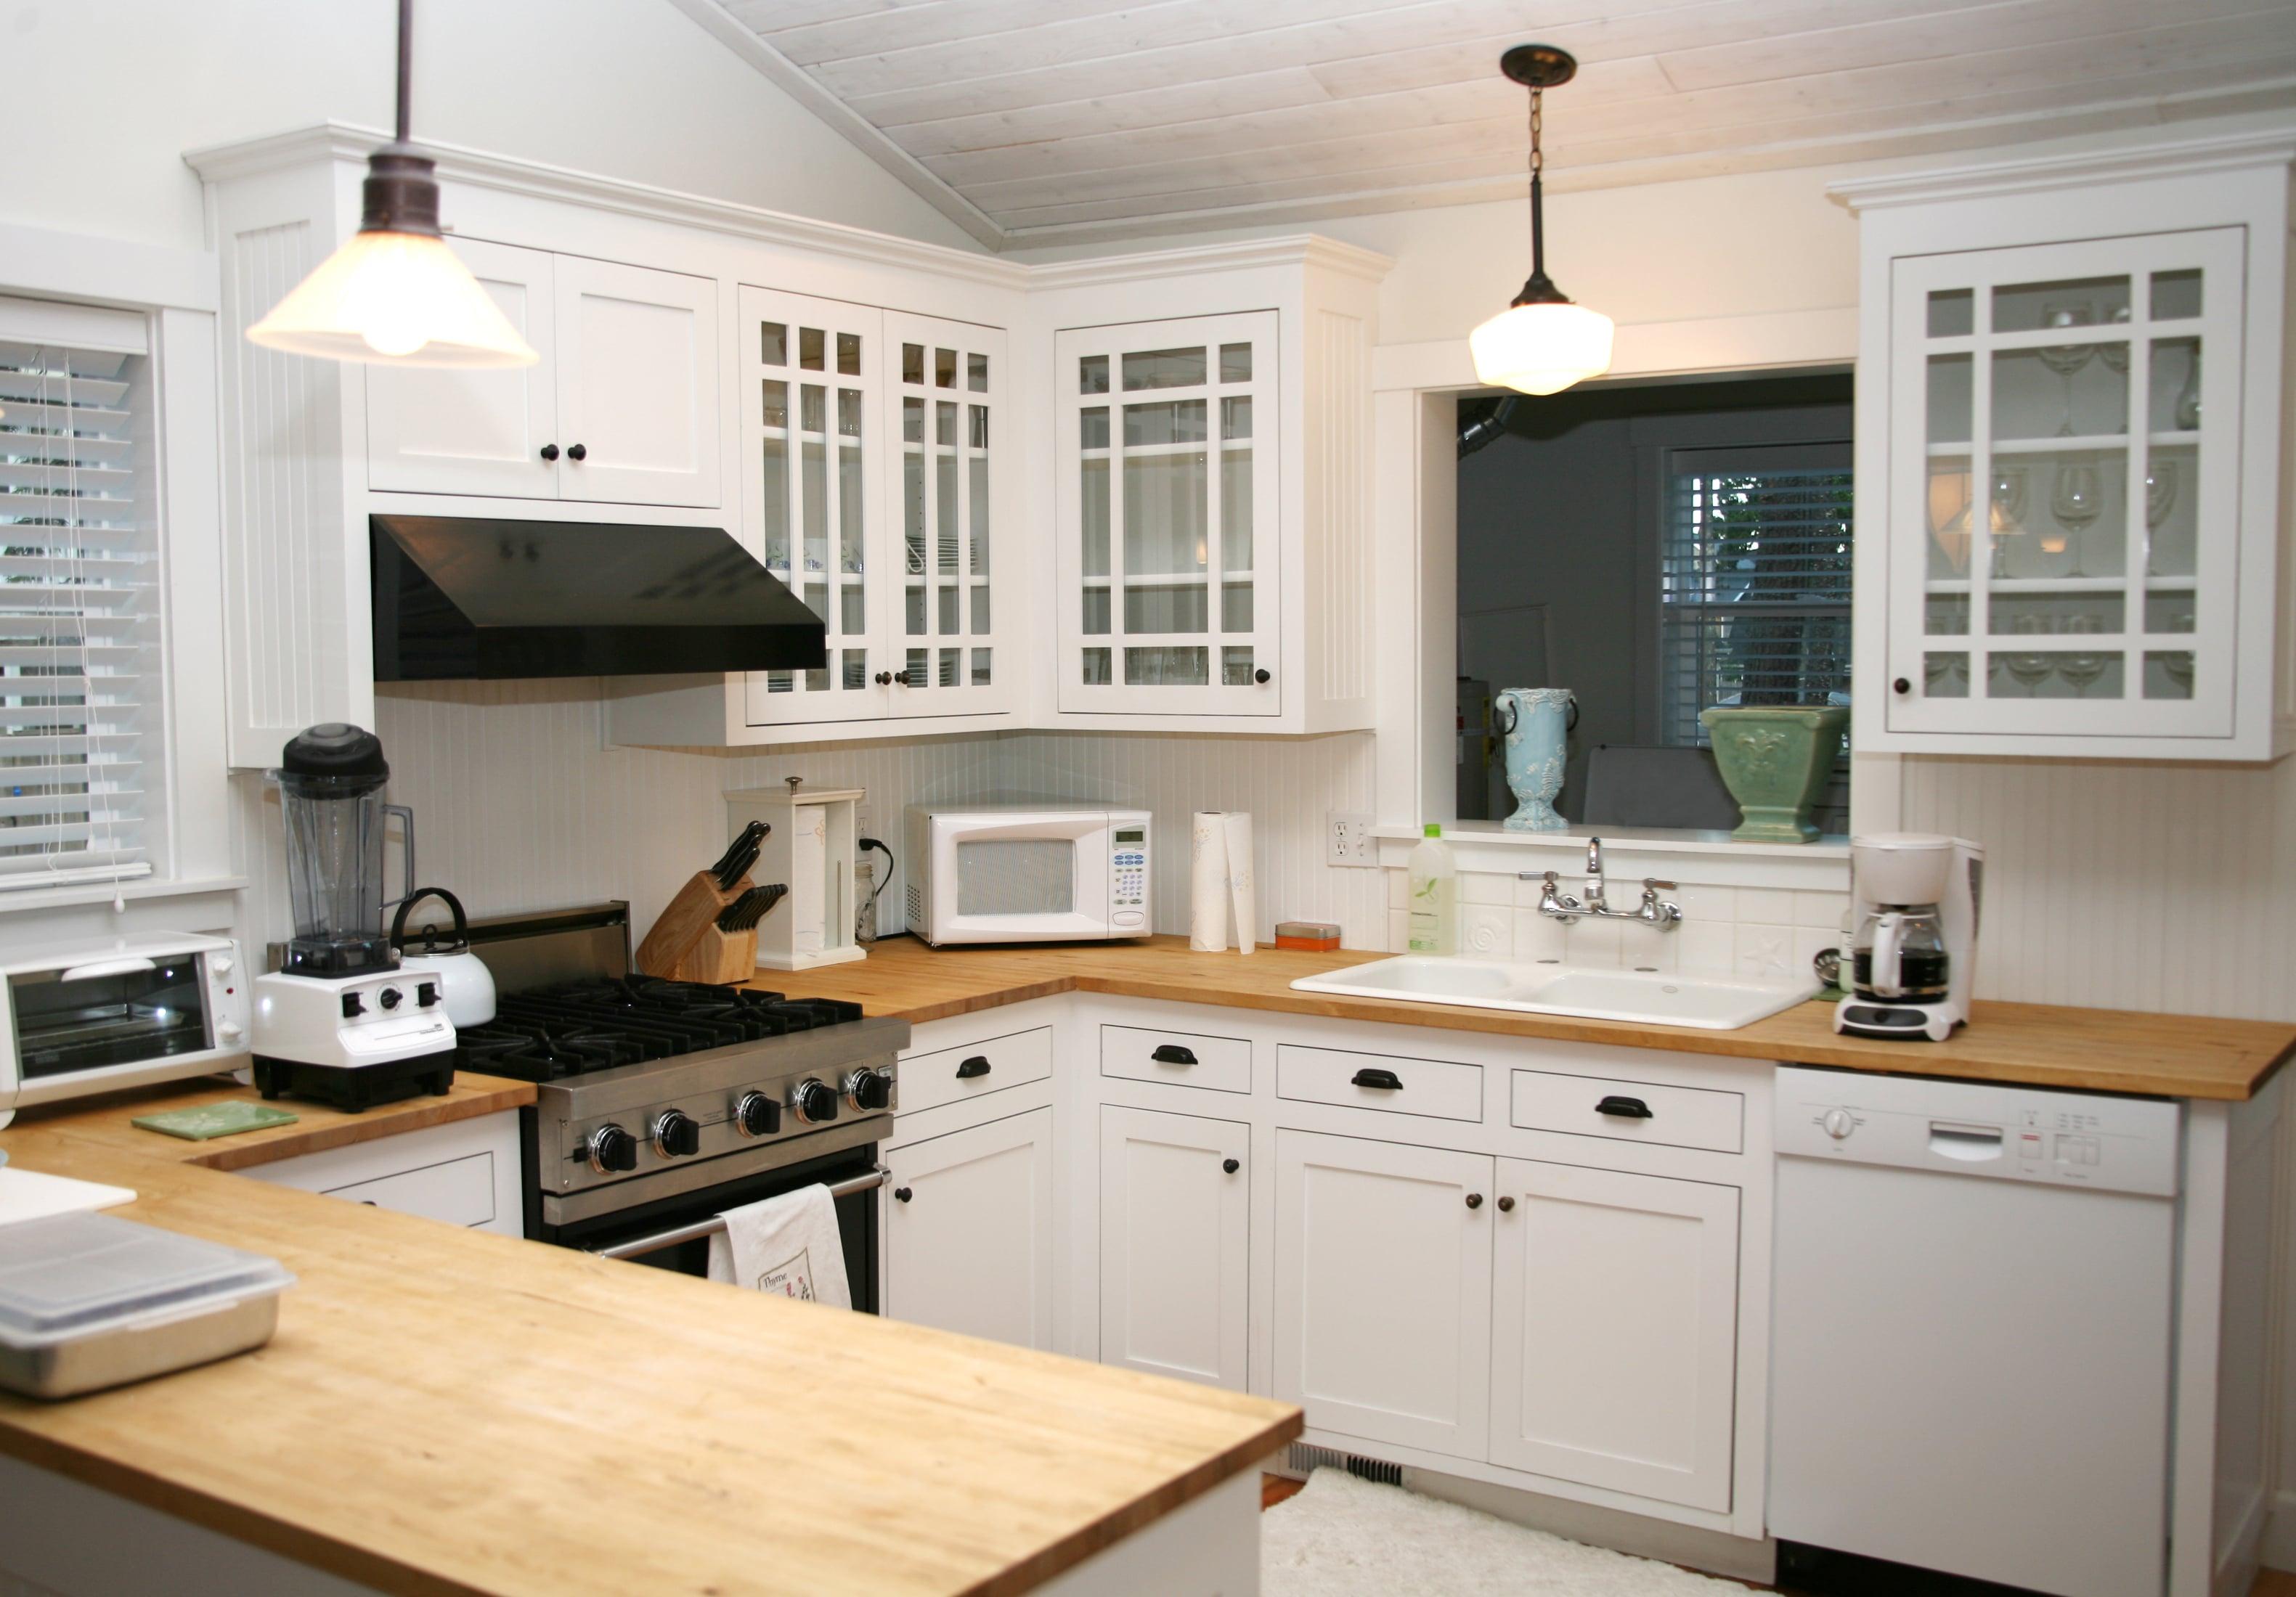 Unique Kitchen Ideas Using Shaker Cabinets Best Online Cabinets